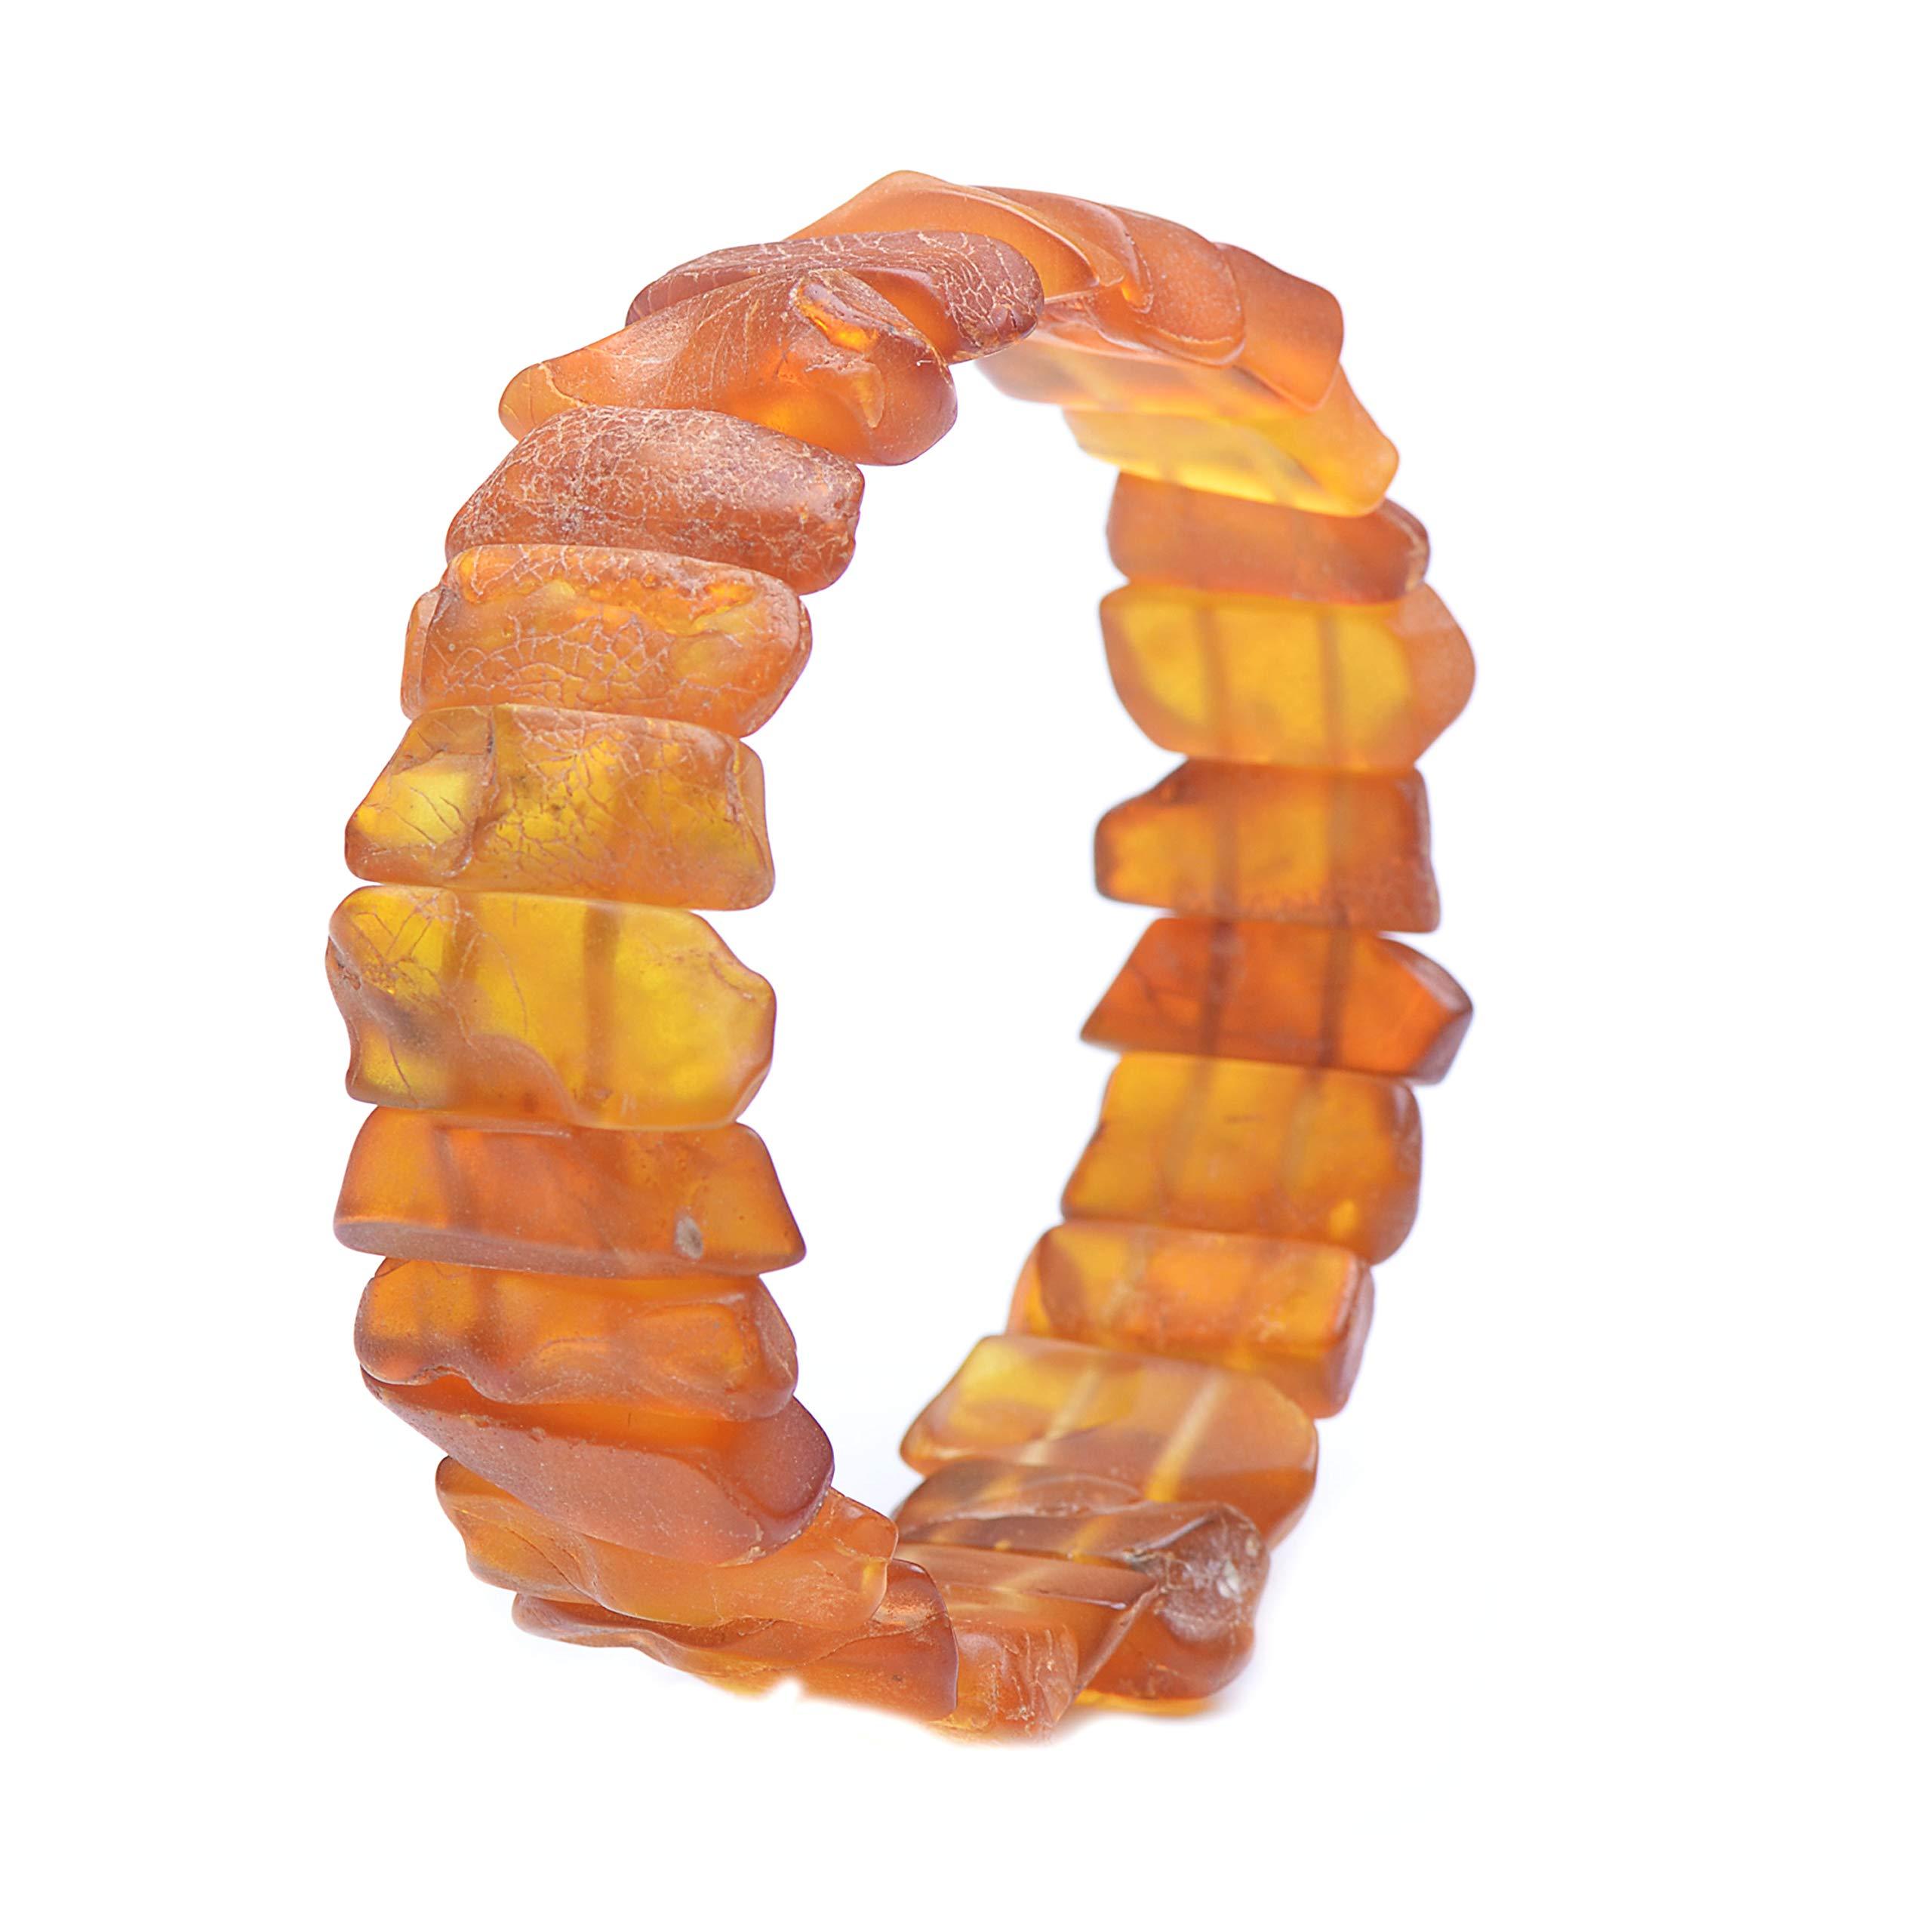 Amber Bracelet - Unique Amber Bracelet - Exclusive Amber Bracelet - Vintage Bracelet - Genuine Baltic Amber by Genuine Amber (Image #2)